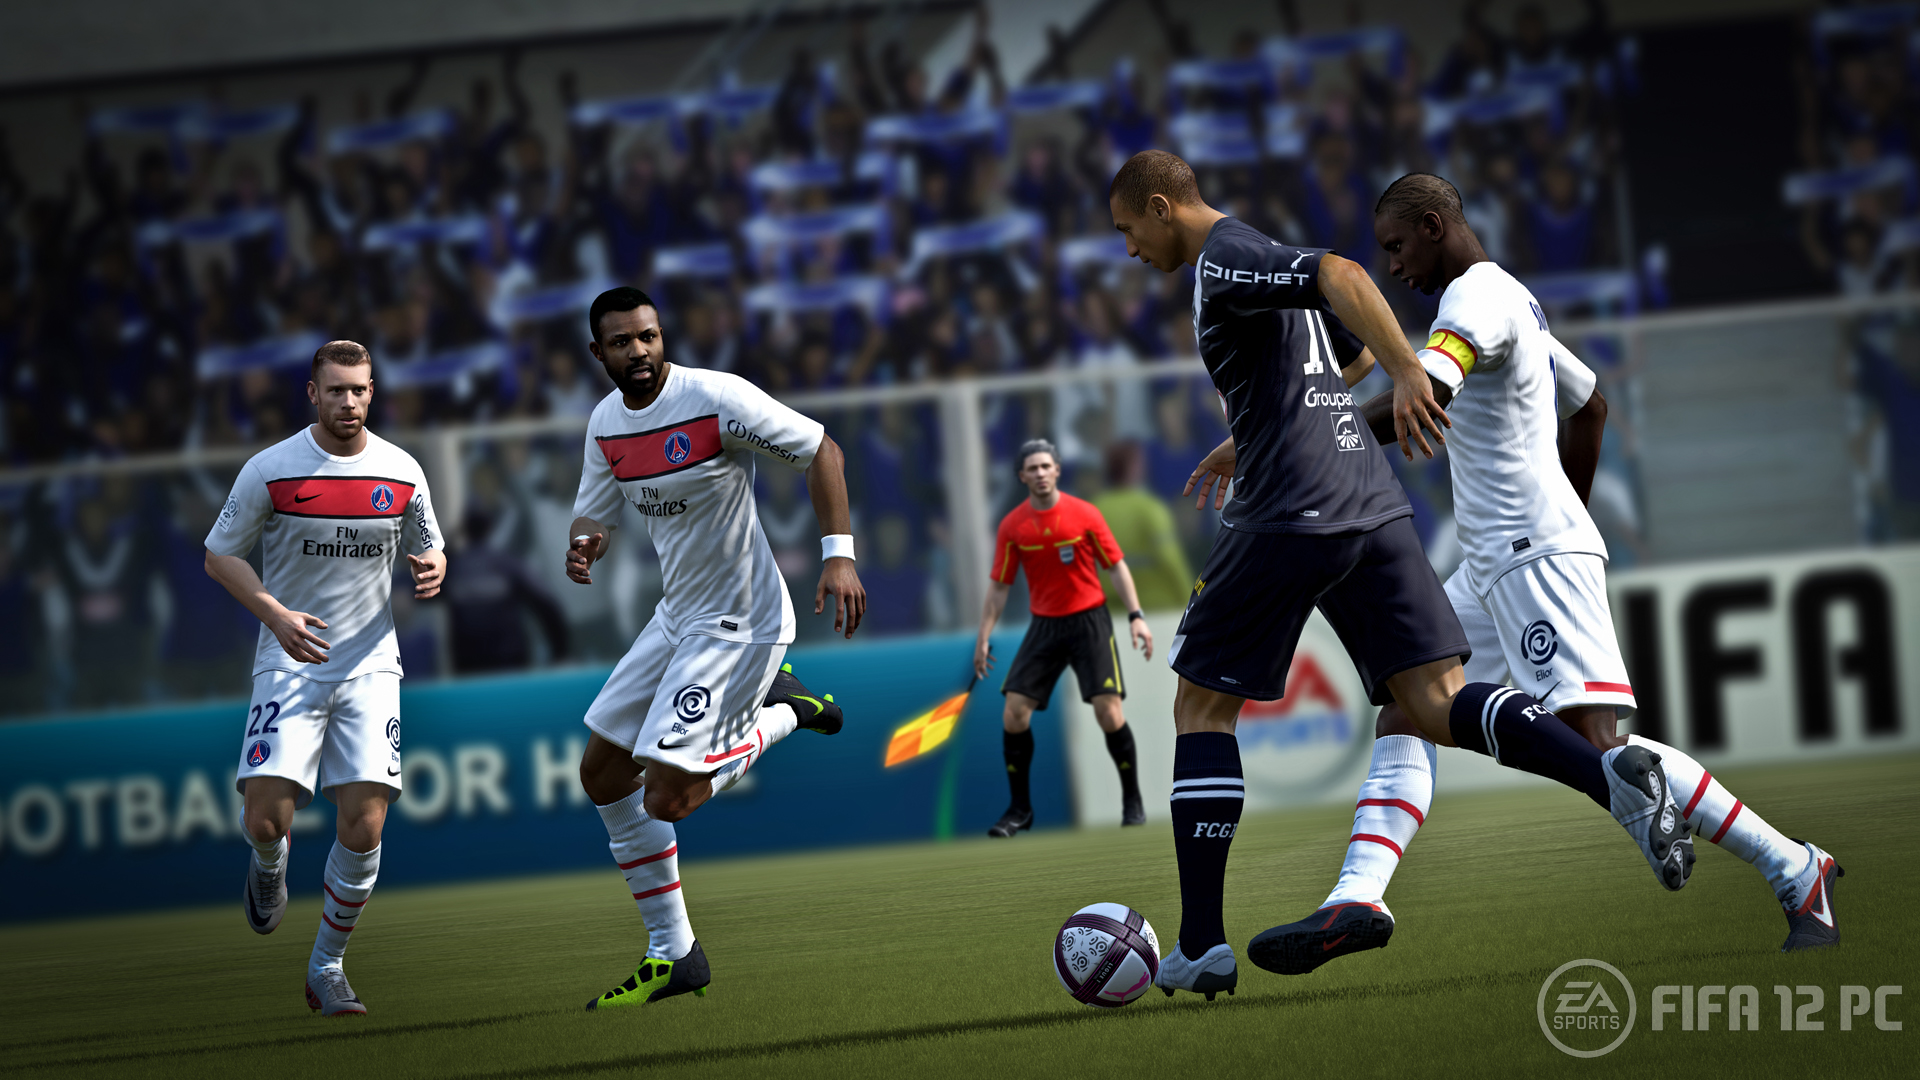 FIFA 12 : Astuces et Guide - jeuxvideocom